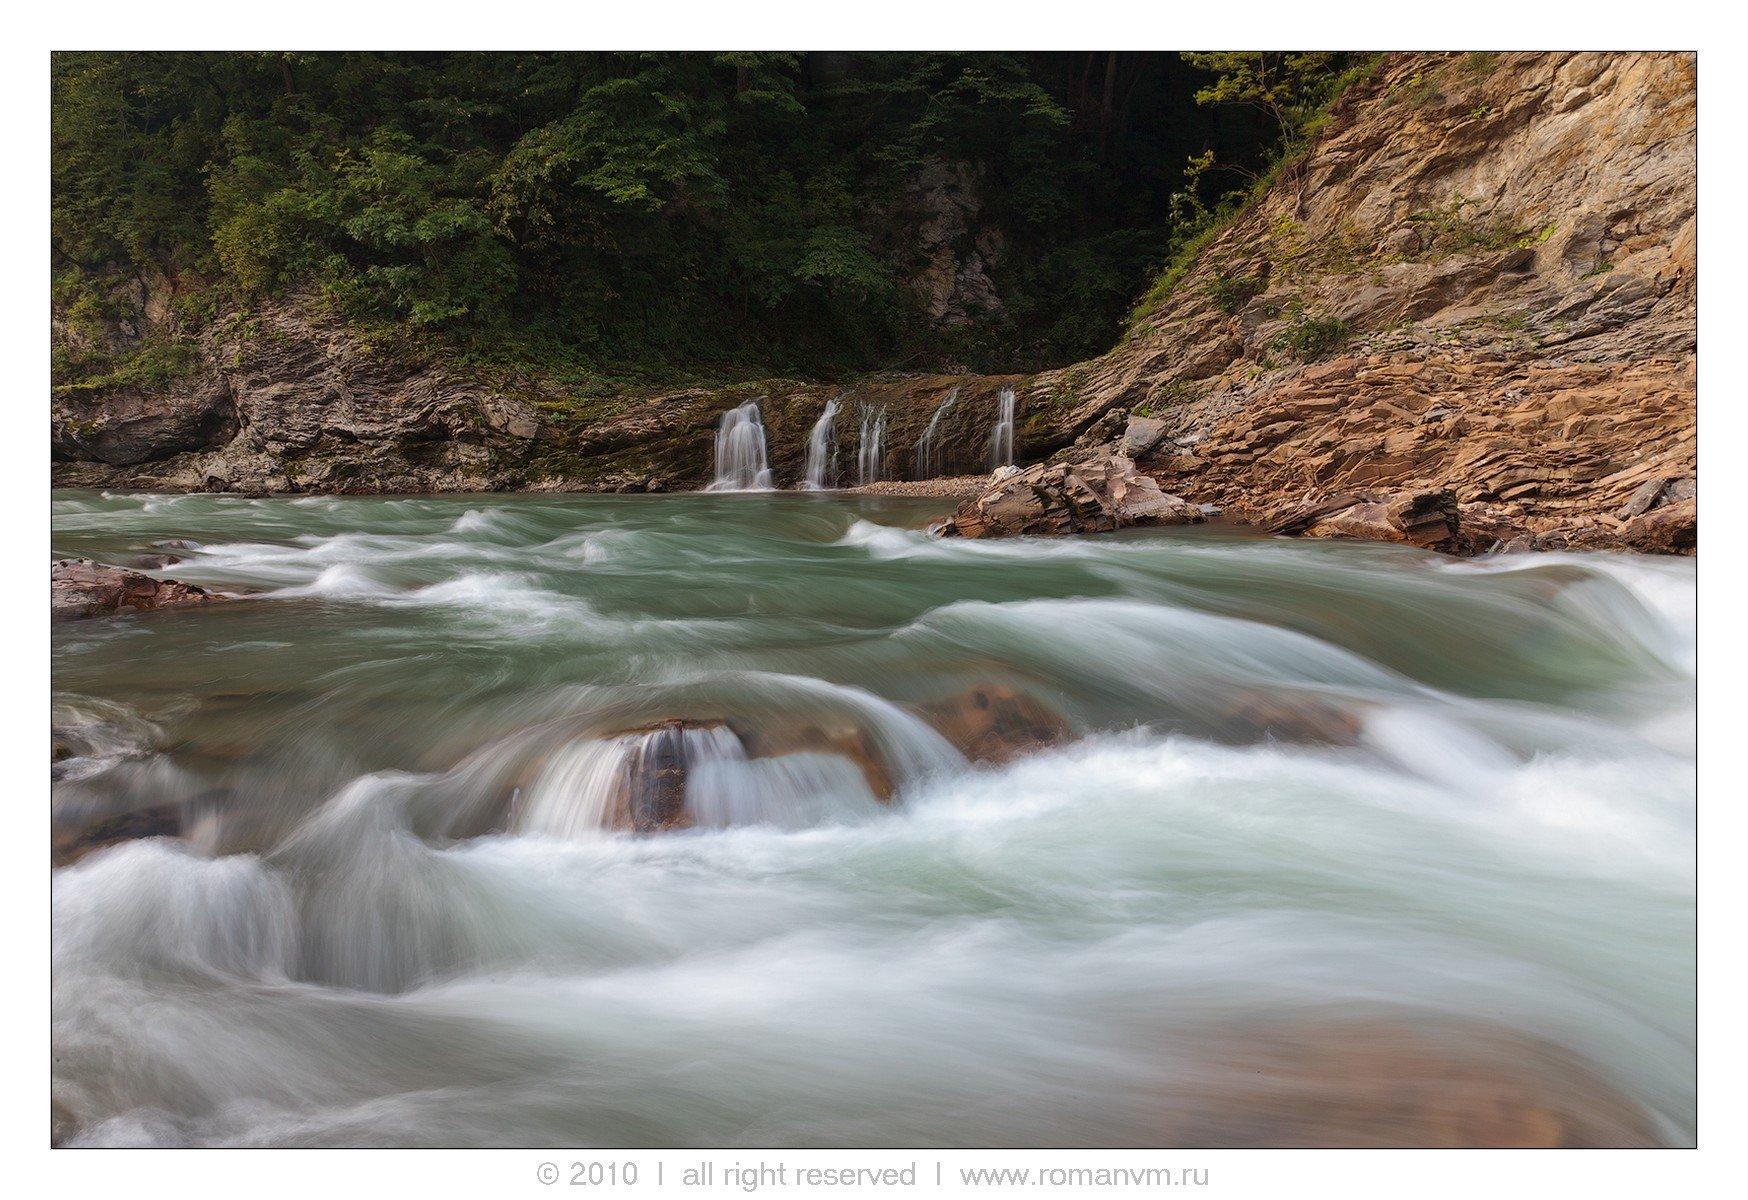 река руфабго, северный кавказ, адыгея, водопад, Роман Мурушкин